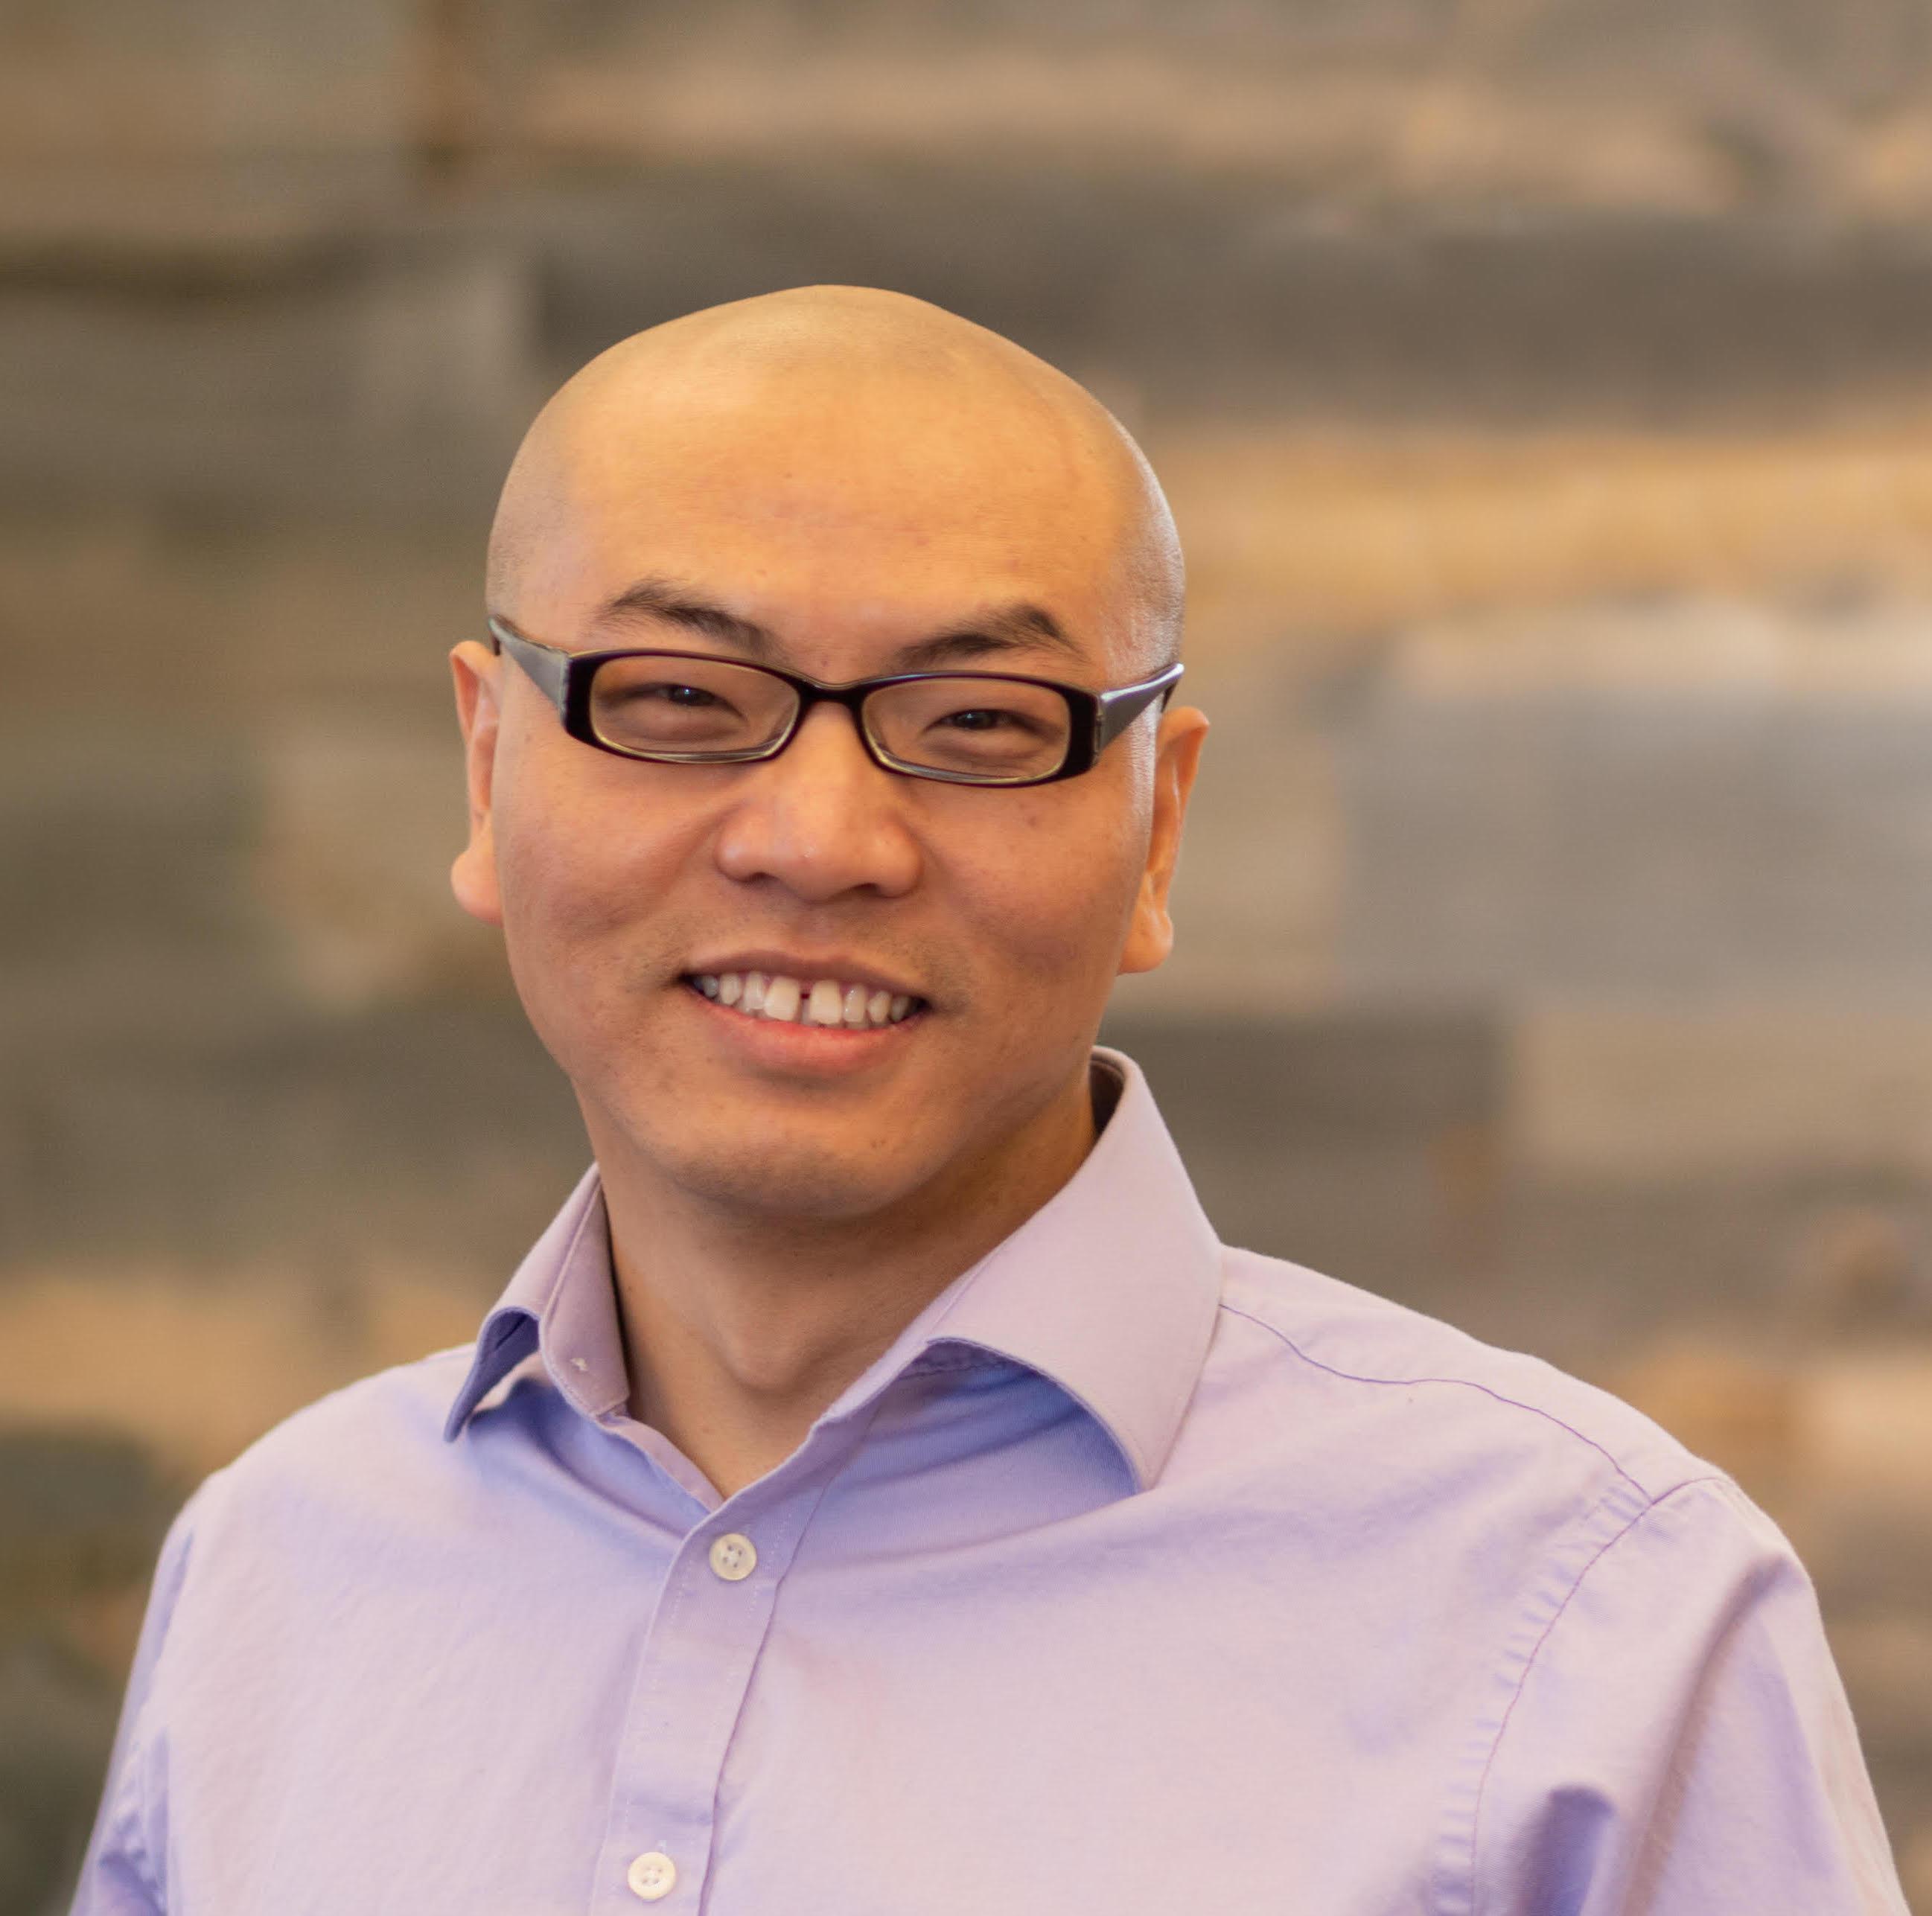 CTO of FeedMob Ken Lu's headshot